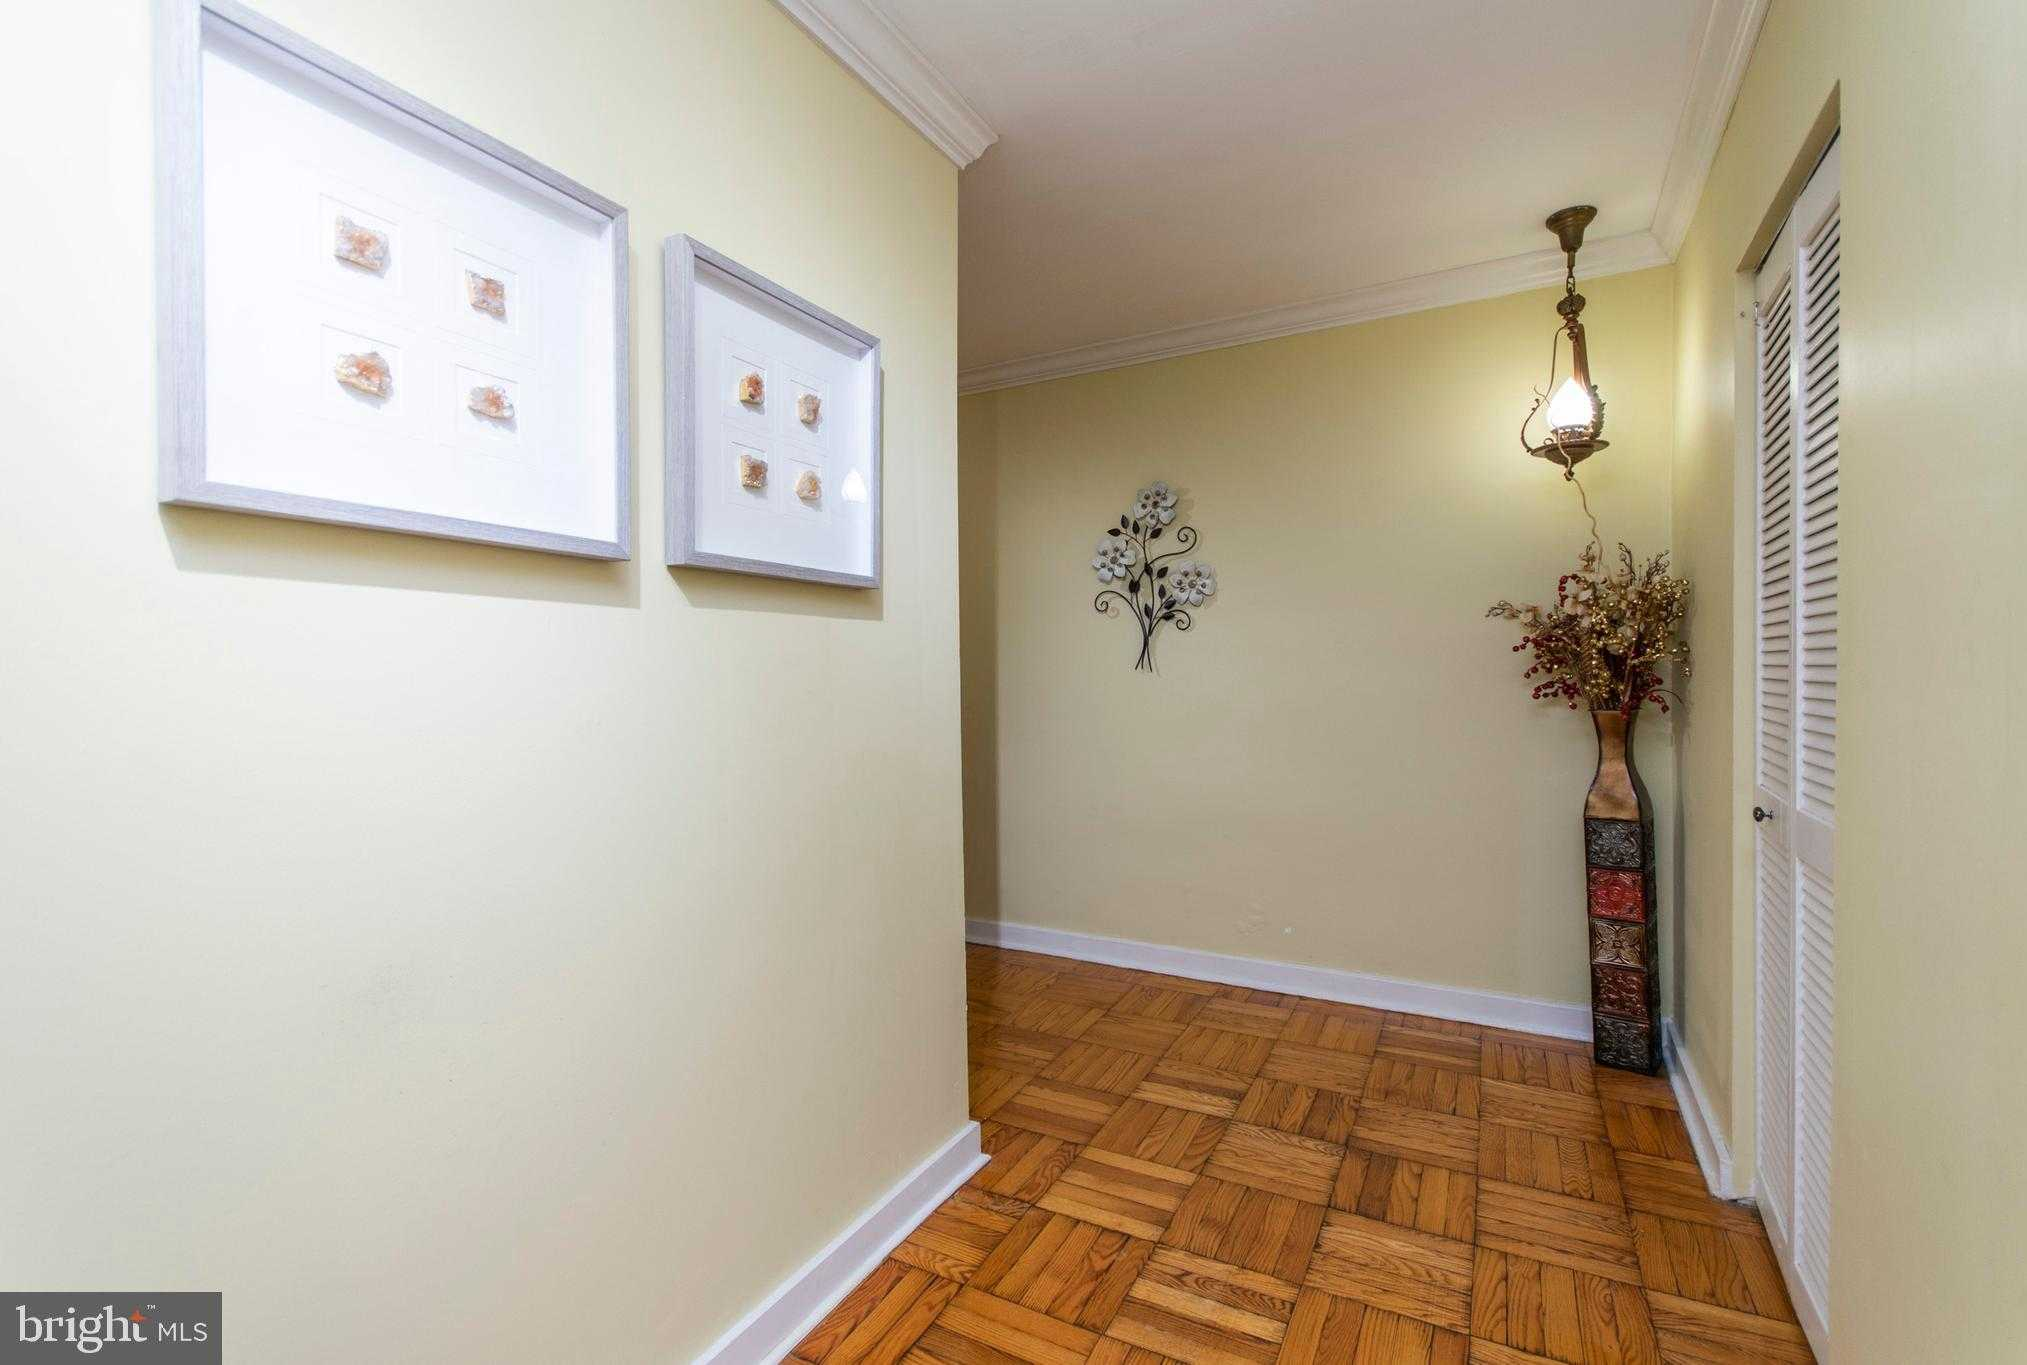 $199,000 - 2Br/1Ba -  for Sale in Art Museum Area, Philadelphia